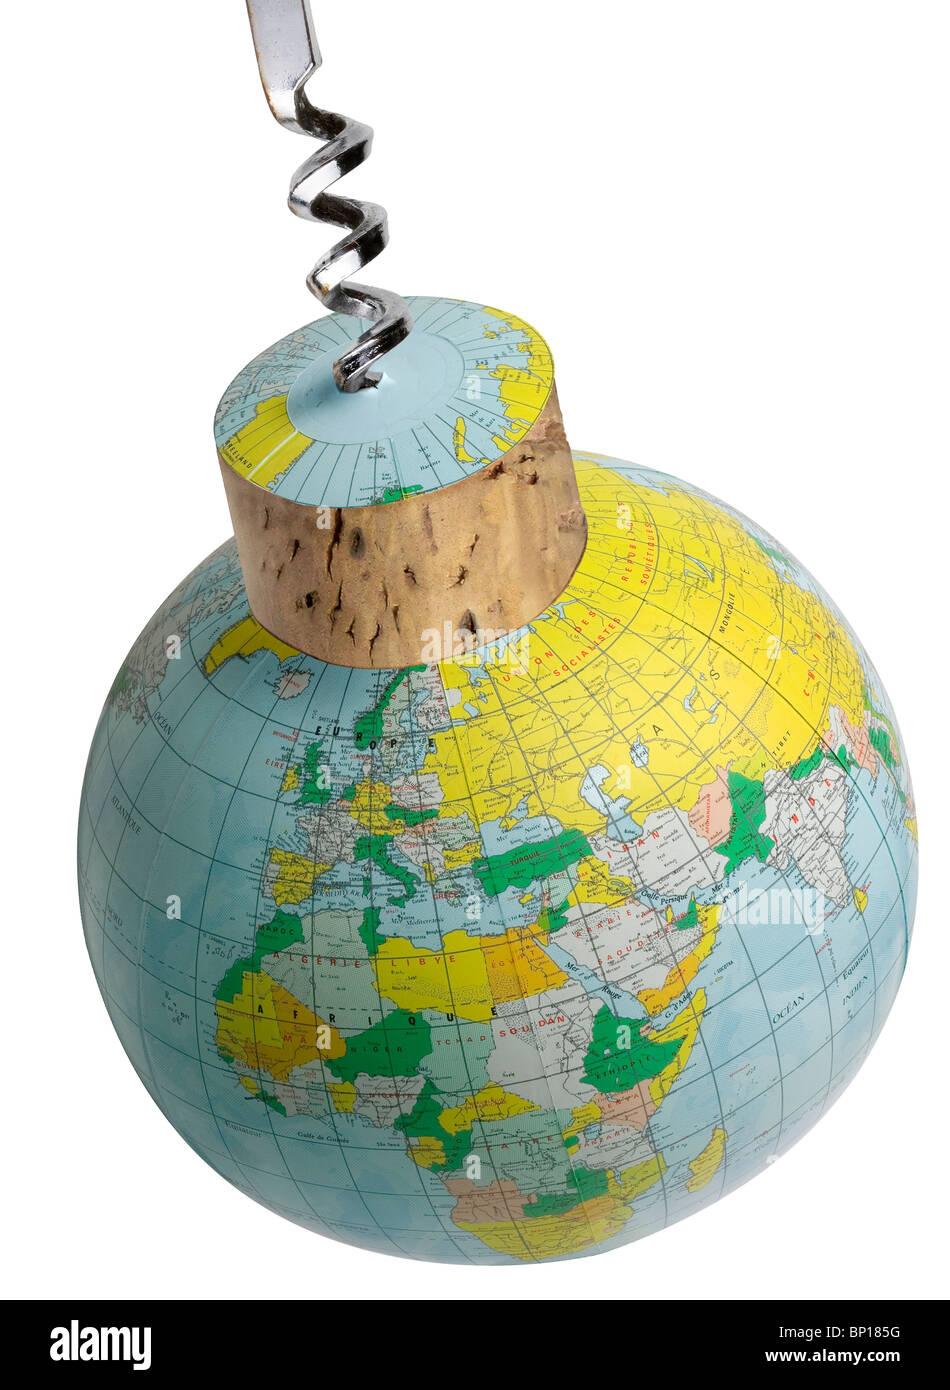 Globe and corkscrew - Stock Image